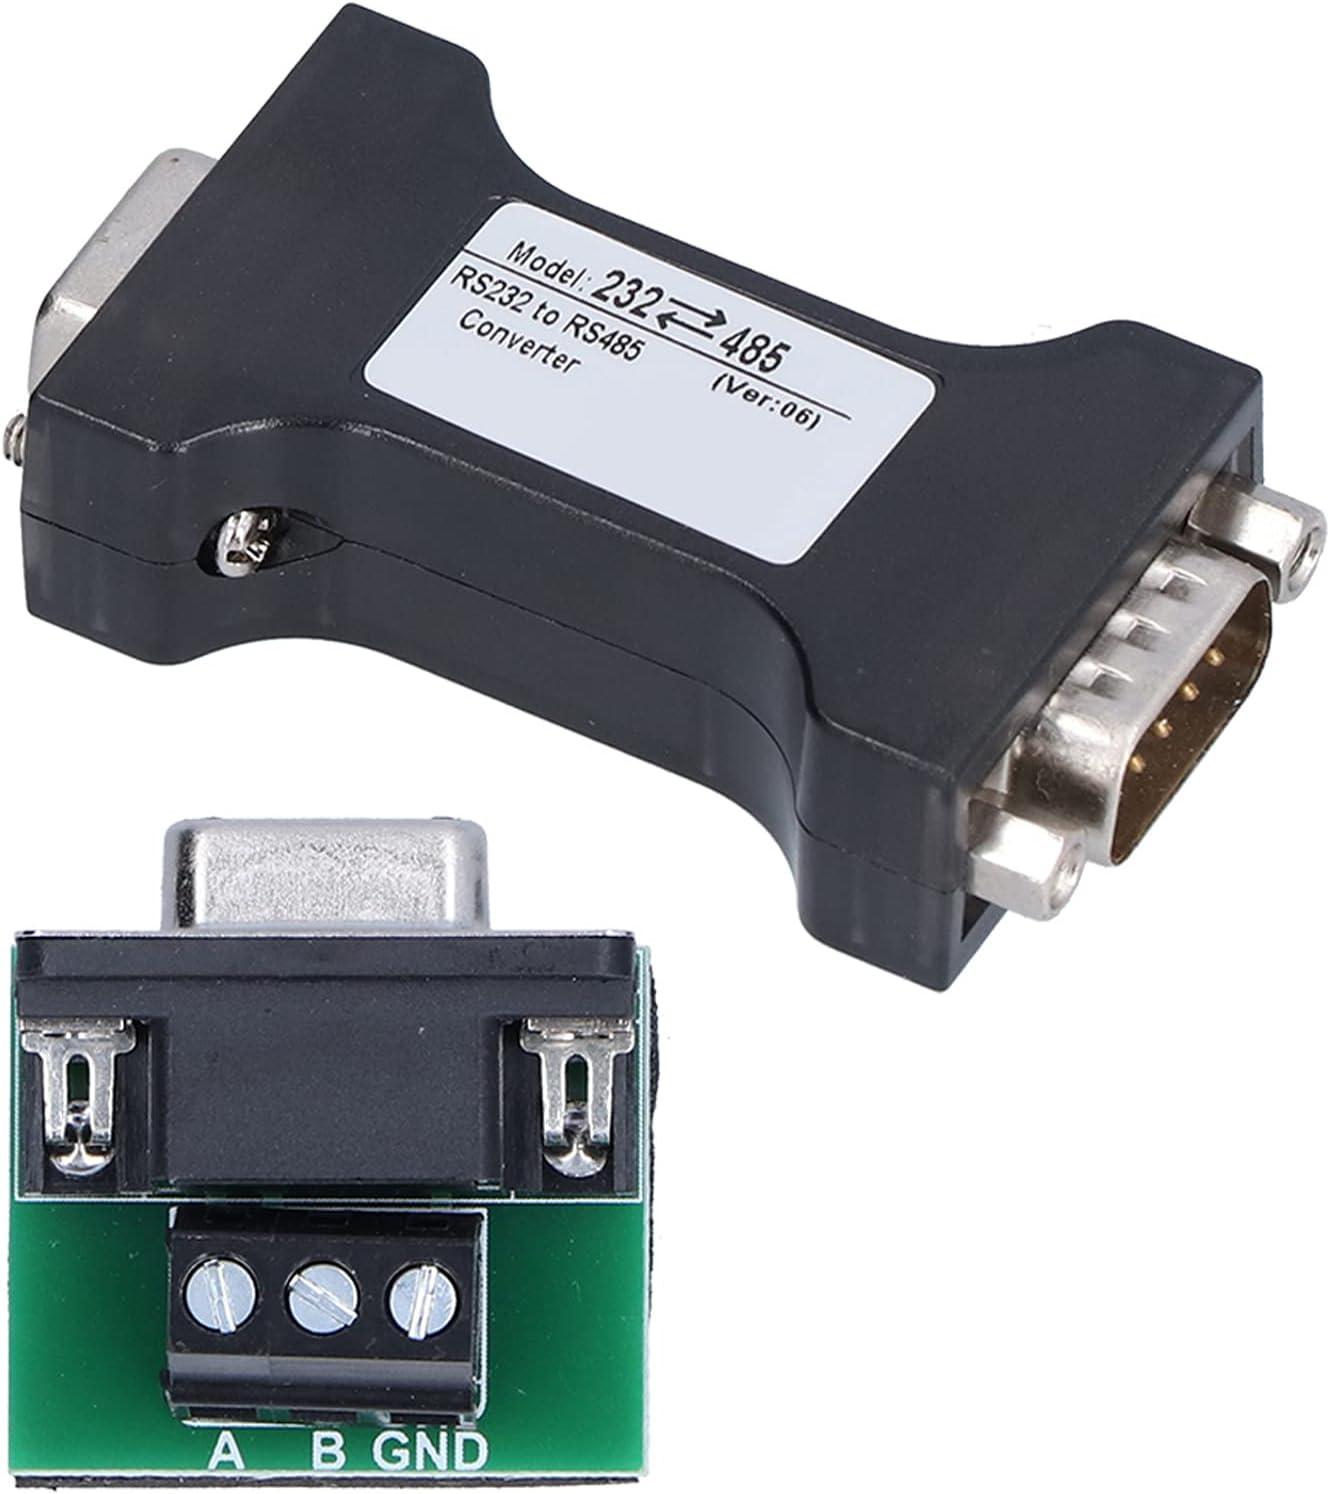 RS232 to RS485 Serial Philadelphia Mall Mini‑Si Communication Max 59% OFF Converter Data